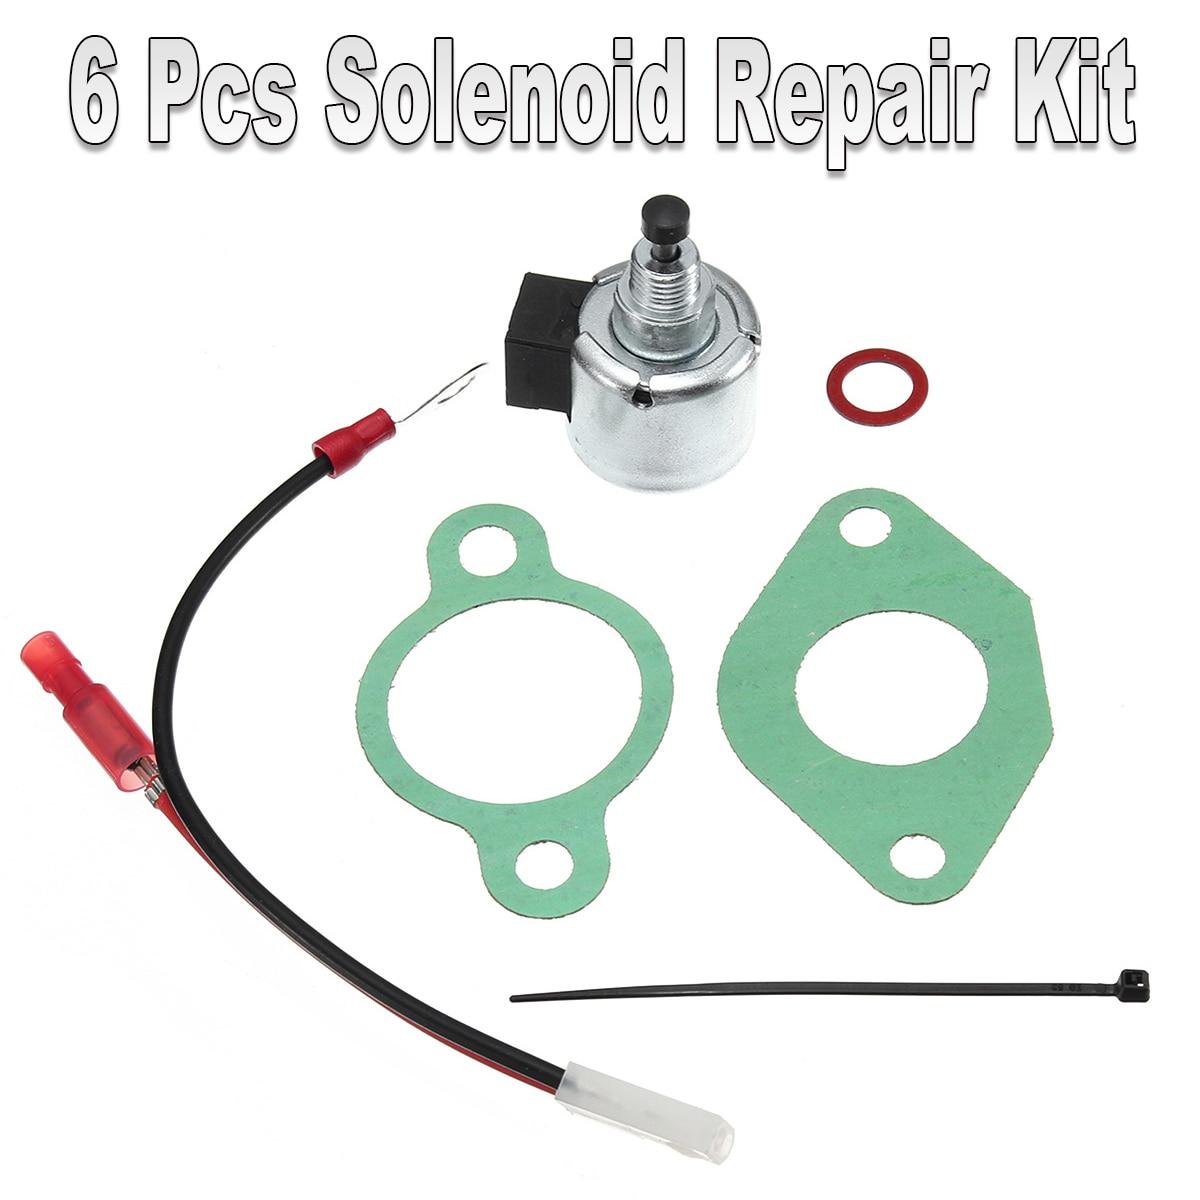 Solenoid Repair Kit Replaces For Kohler Nos. 12-757-09, 12-757-33 S & 1275733 CarburetorsSolenoid Repair Kit Replaces For Kohler Nos. 12-757-09, 12-757-33 S & 1275733 Carburetors